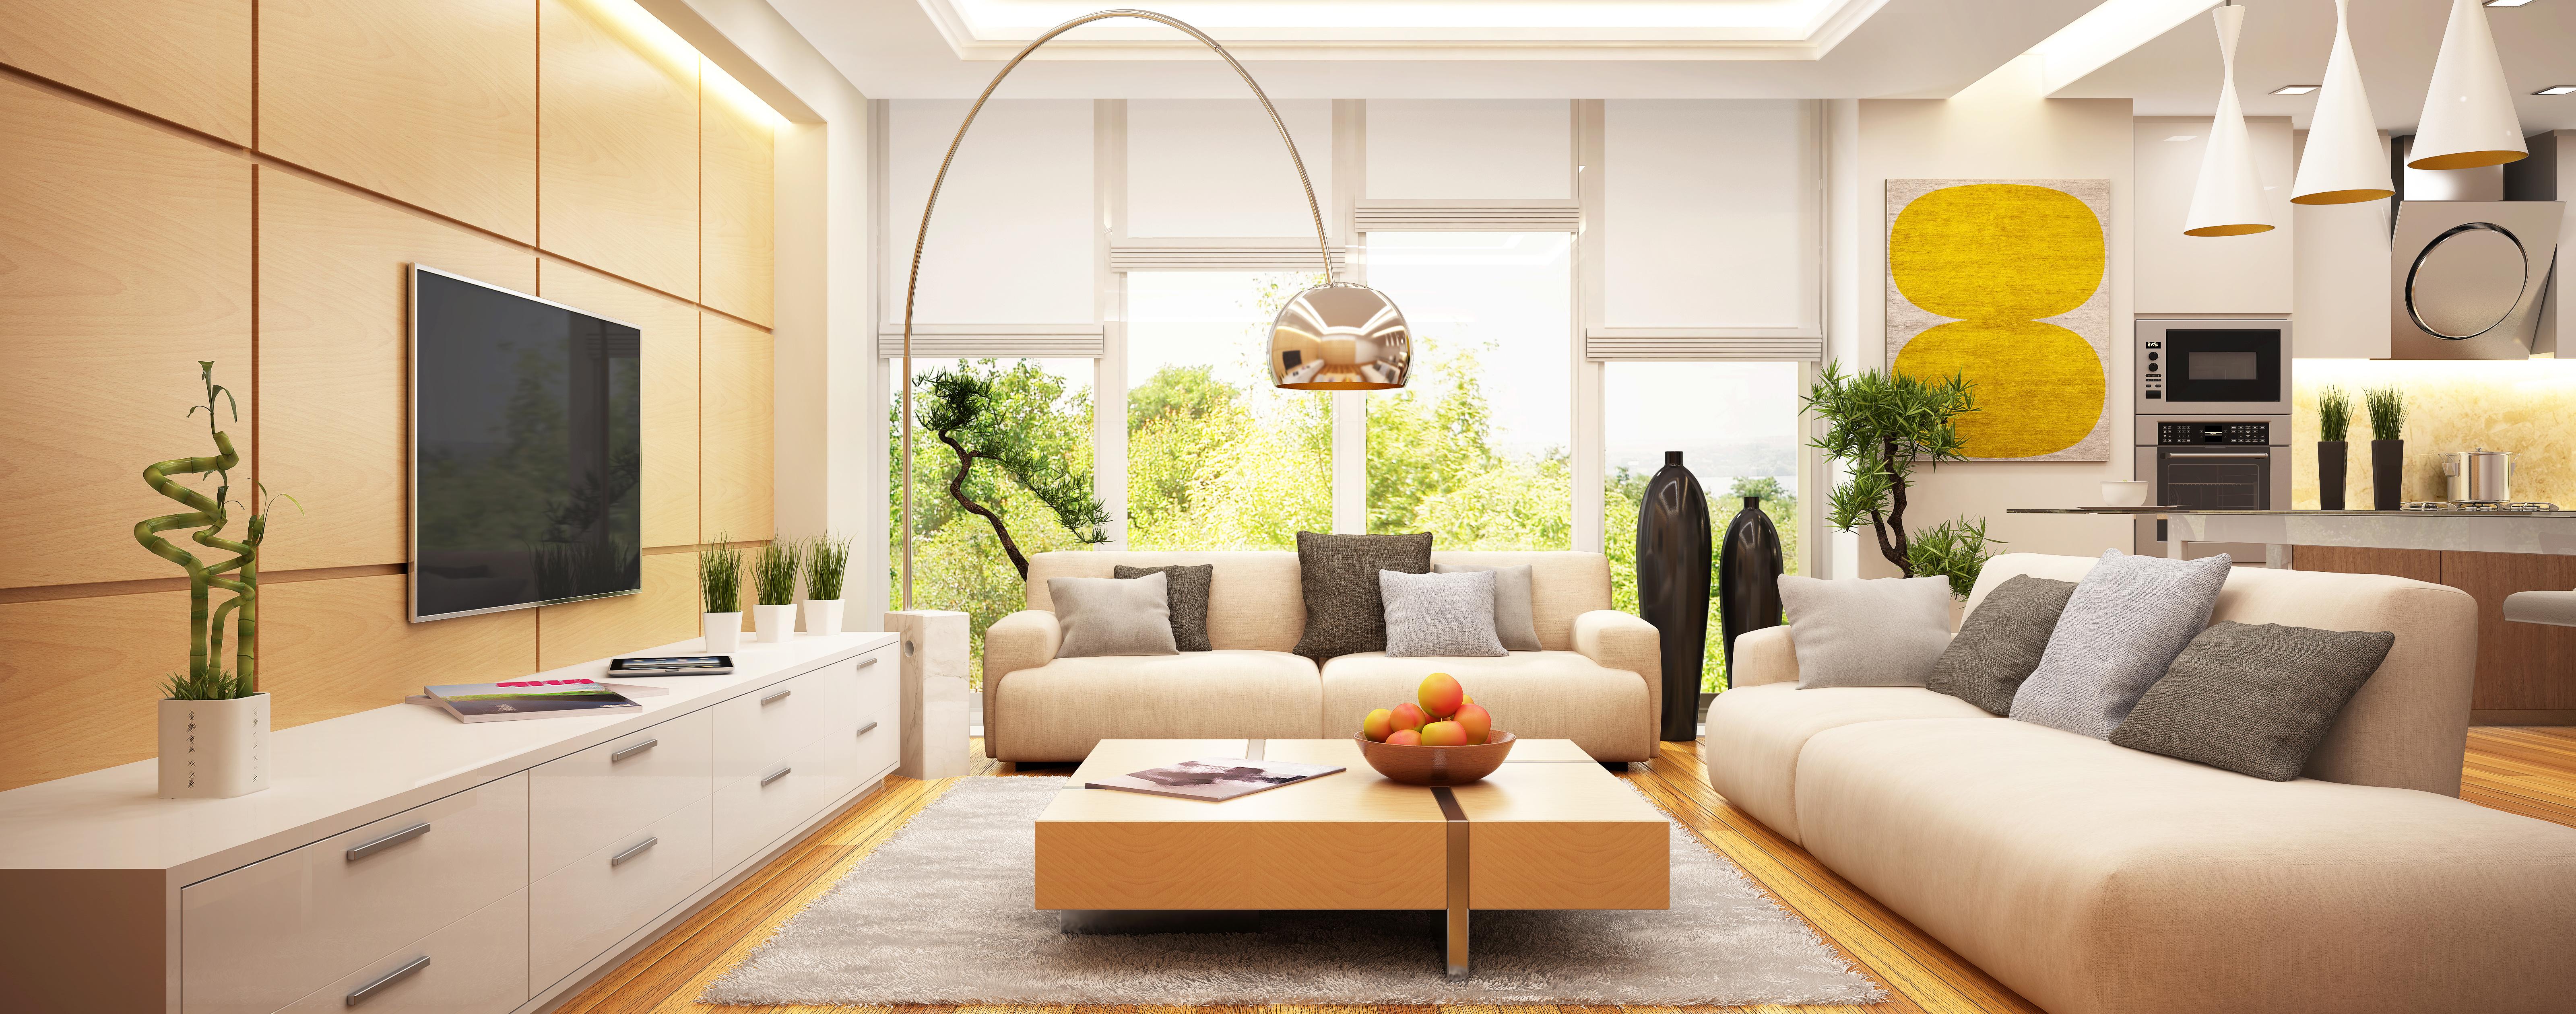 luxus pendelleuchte f r hohe decken emaison co. Black Bedroom Furniture Sets. Home Design Ideas